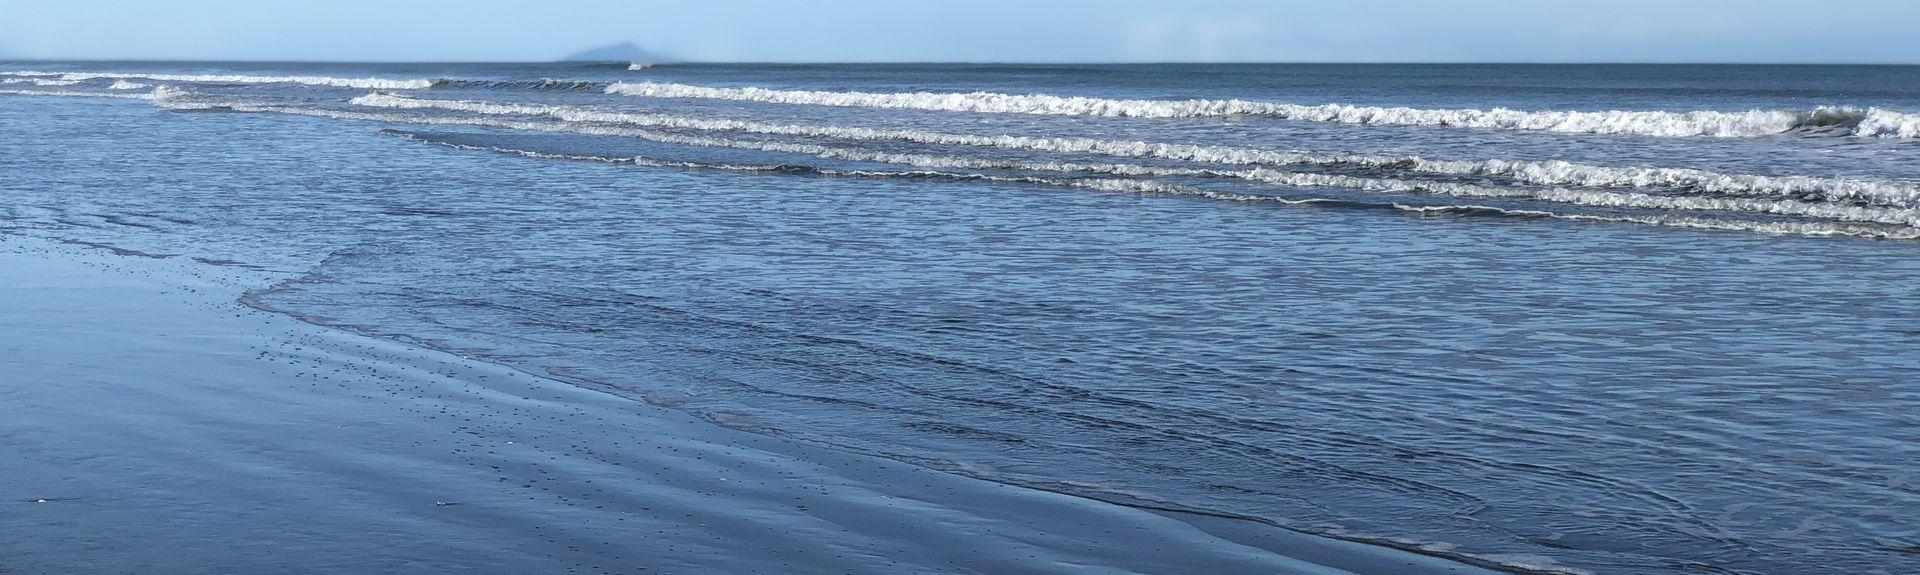 Waitarere Beach, Horowhenua, Manawatu-Wanganui, New Zealand